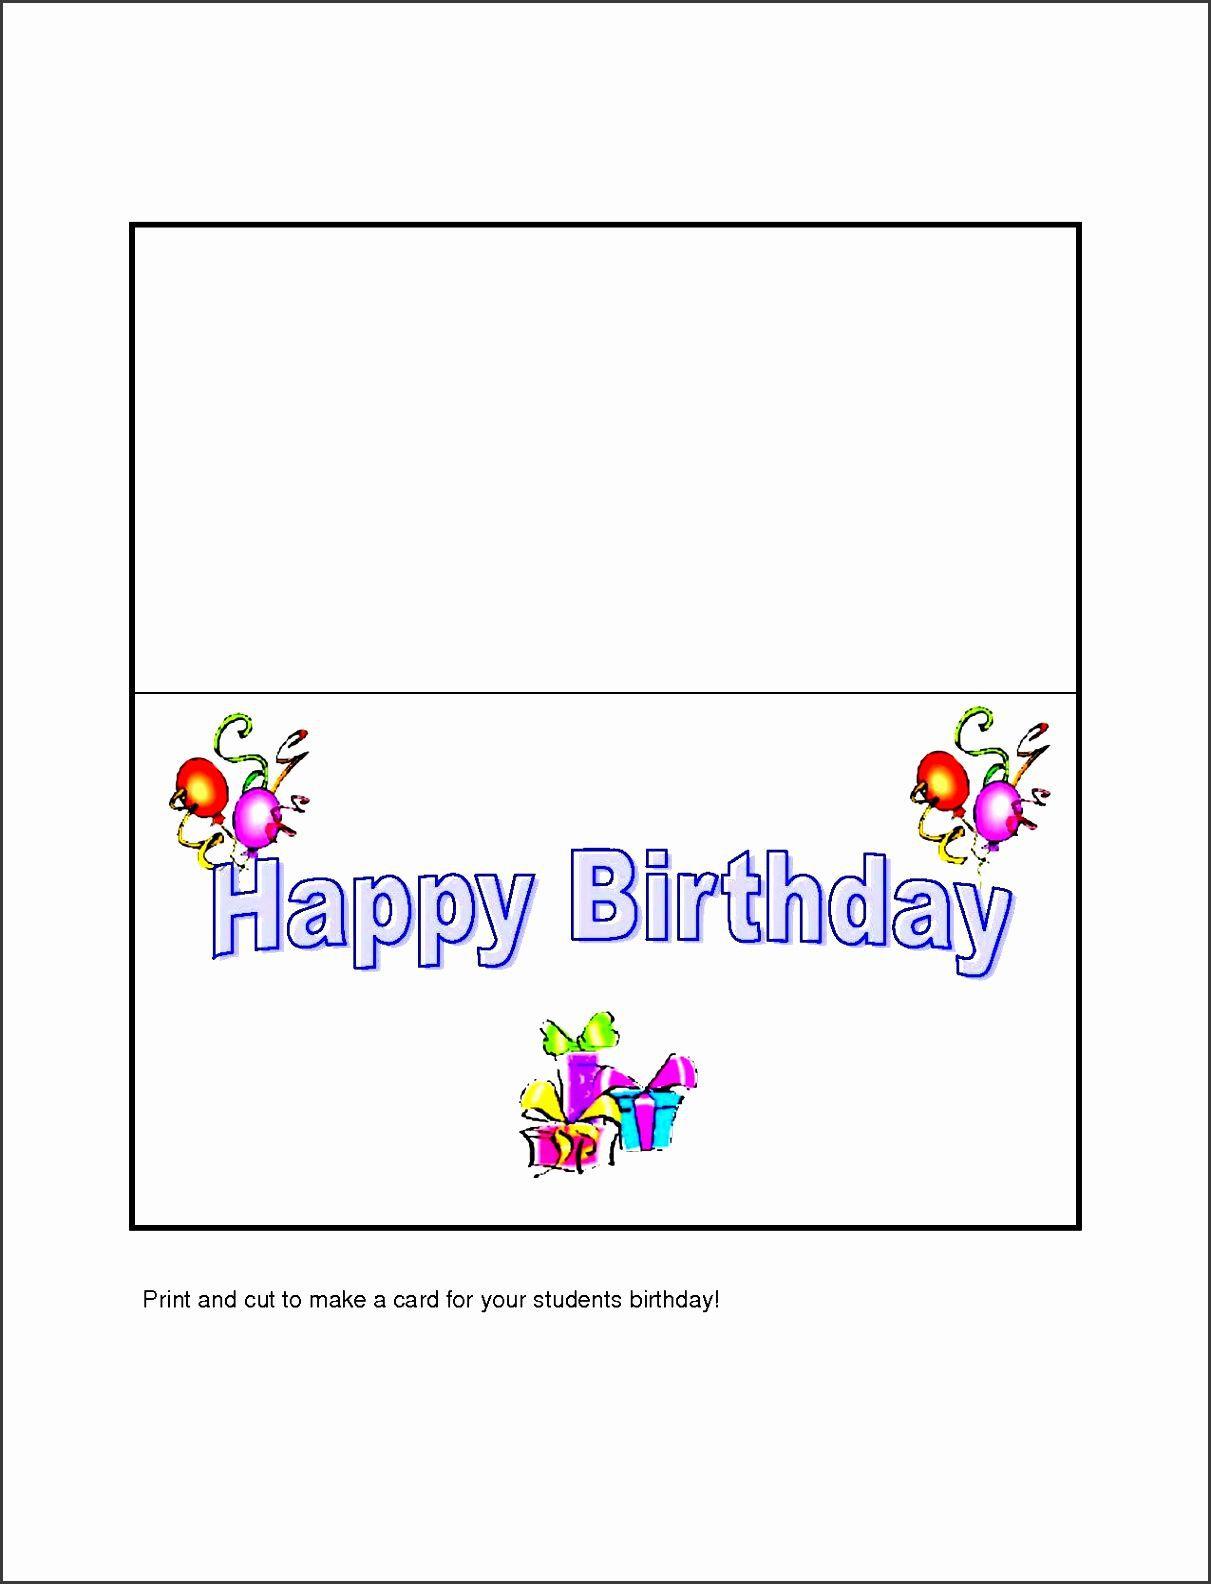 007 Amazing Microsoft Word Greeting Card Template Design  2003 Birthday DownloadFull